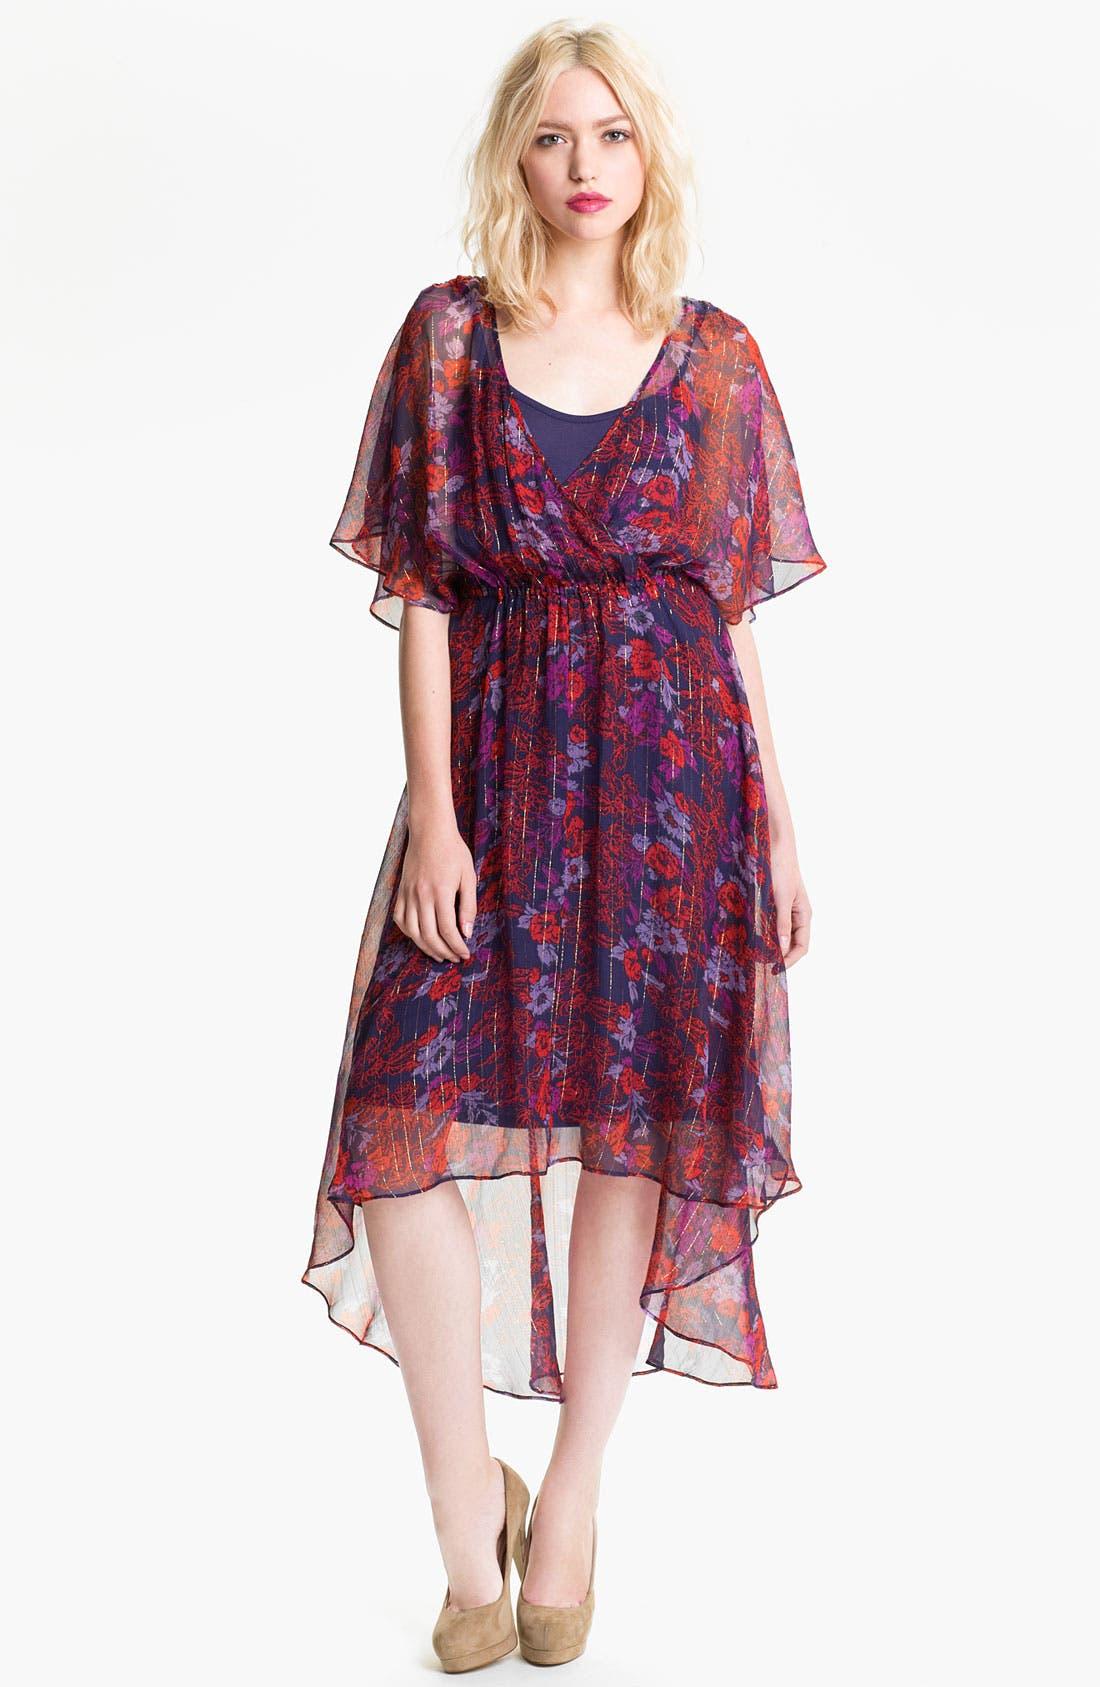 Main Image - Ella Moss 'Rosemary' High/Low Print Dress